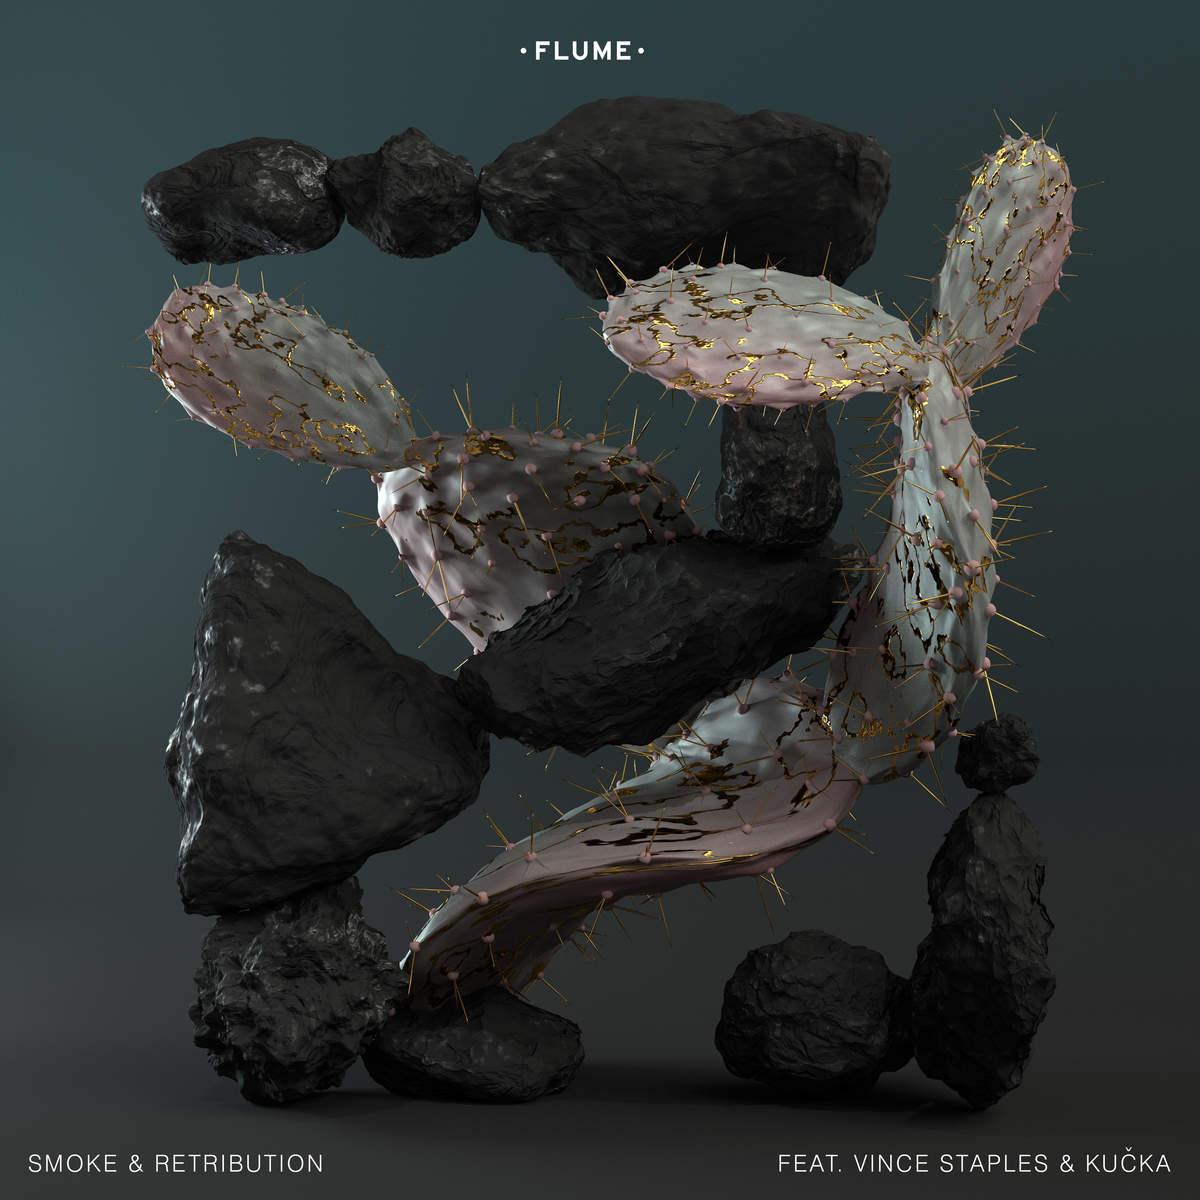 flume smoke and retribution